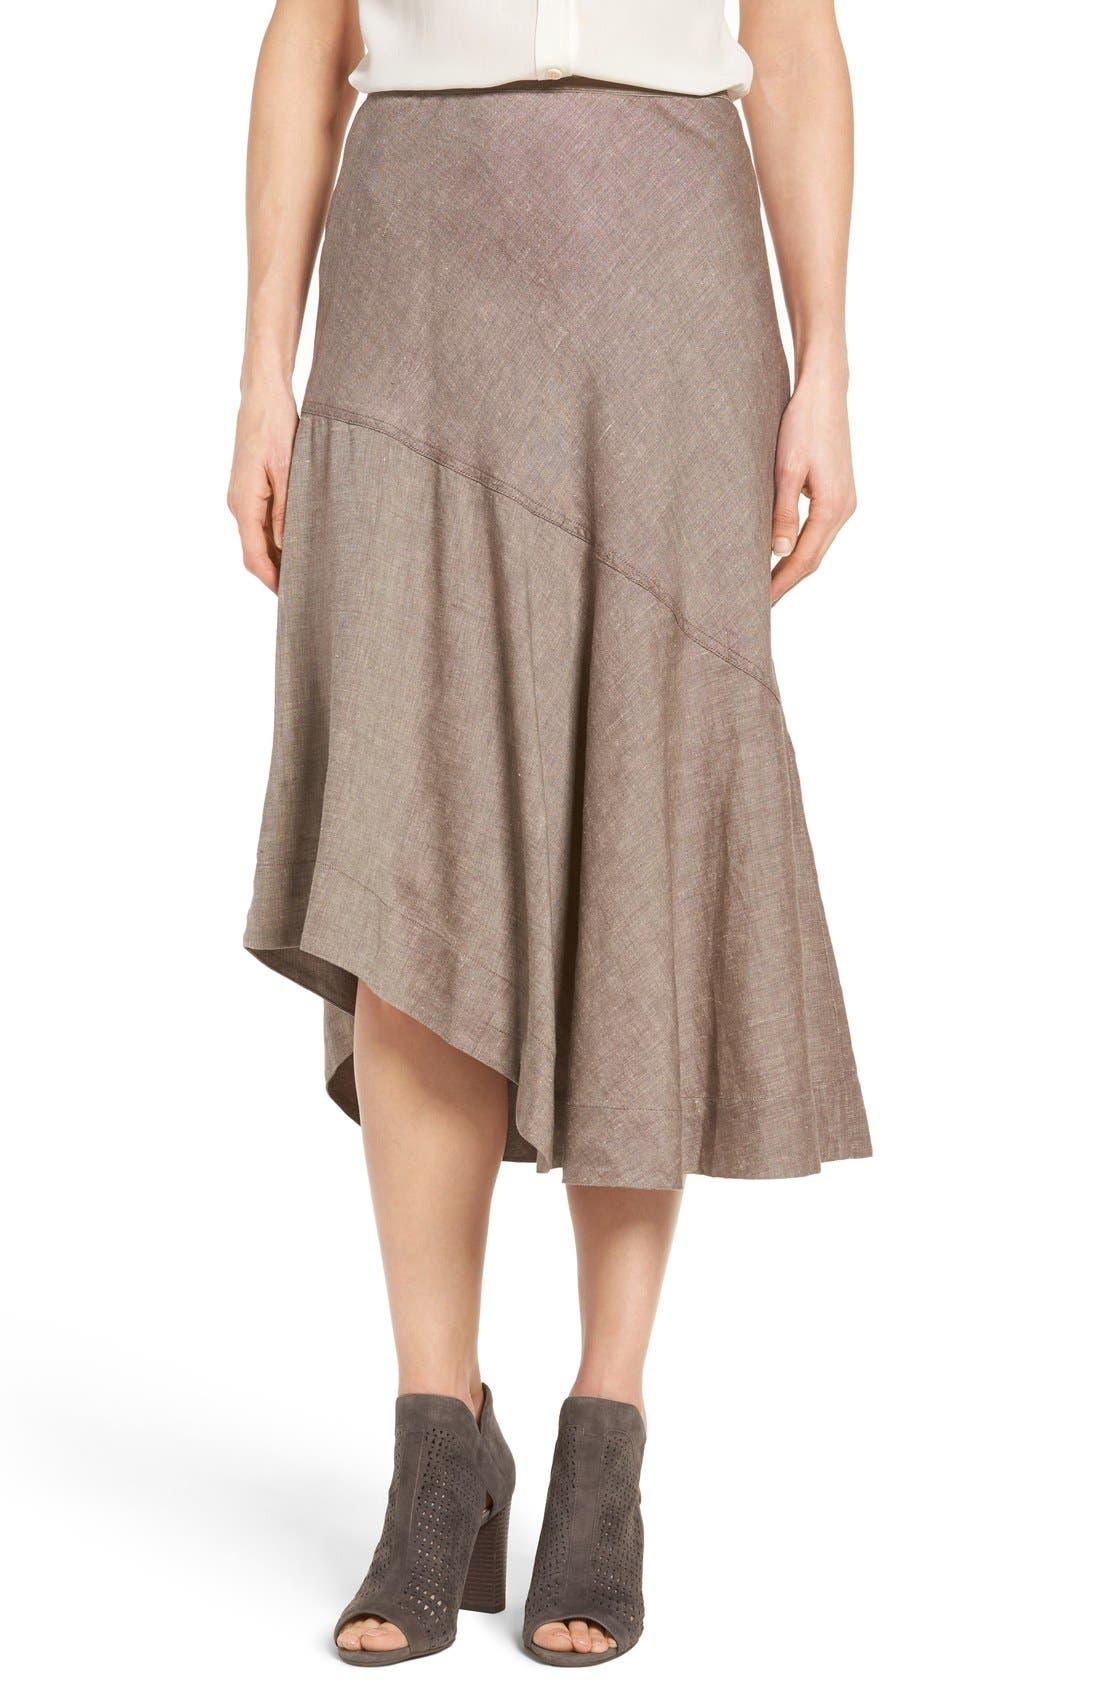 NIC+ZOE 'The Long Engagement' Midi Skirt